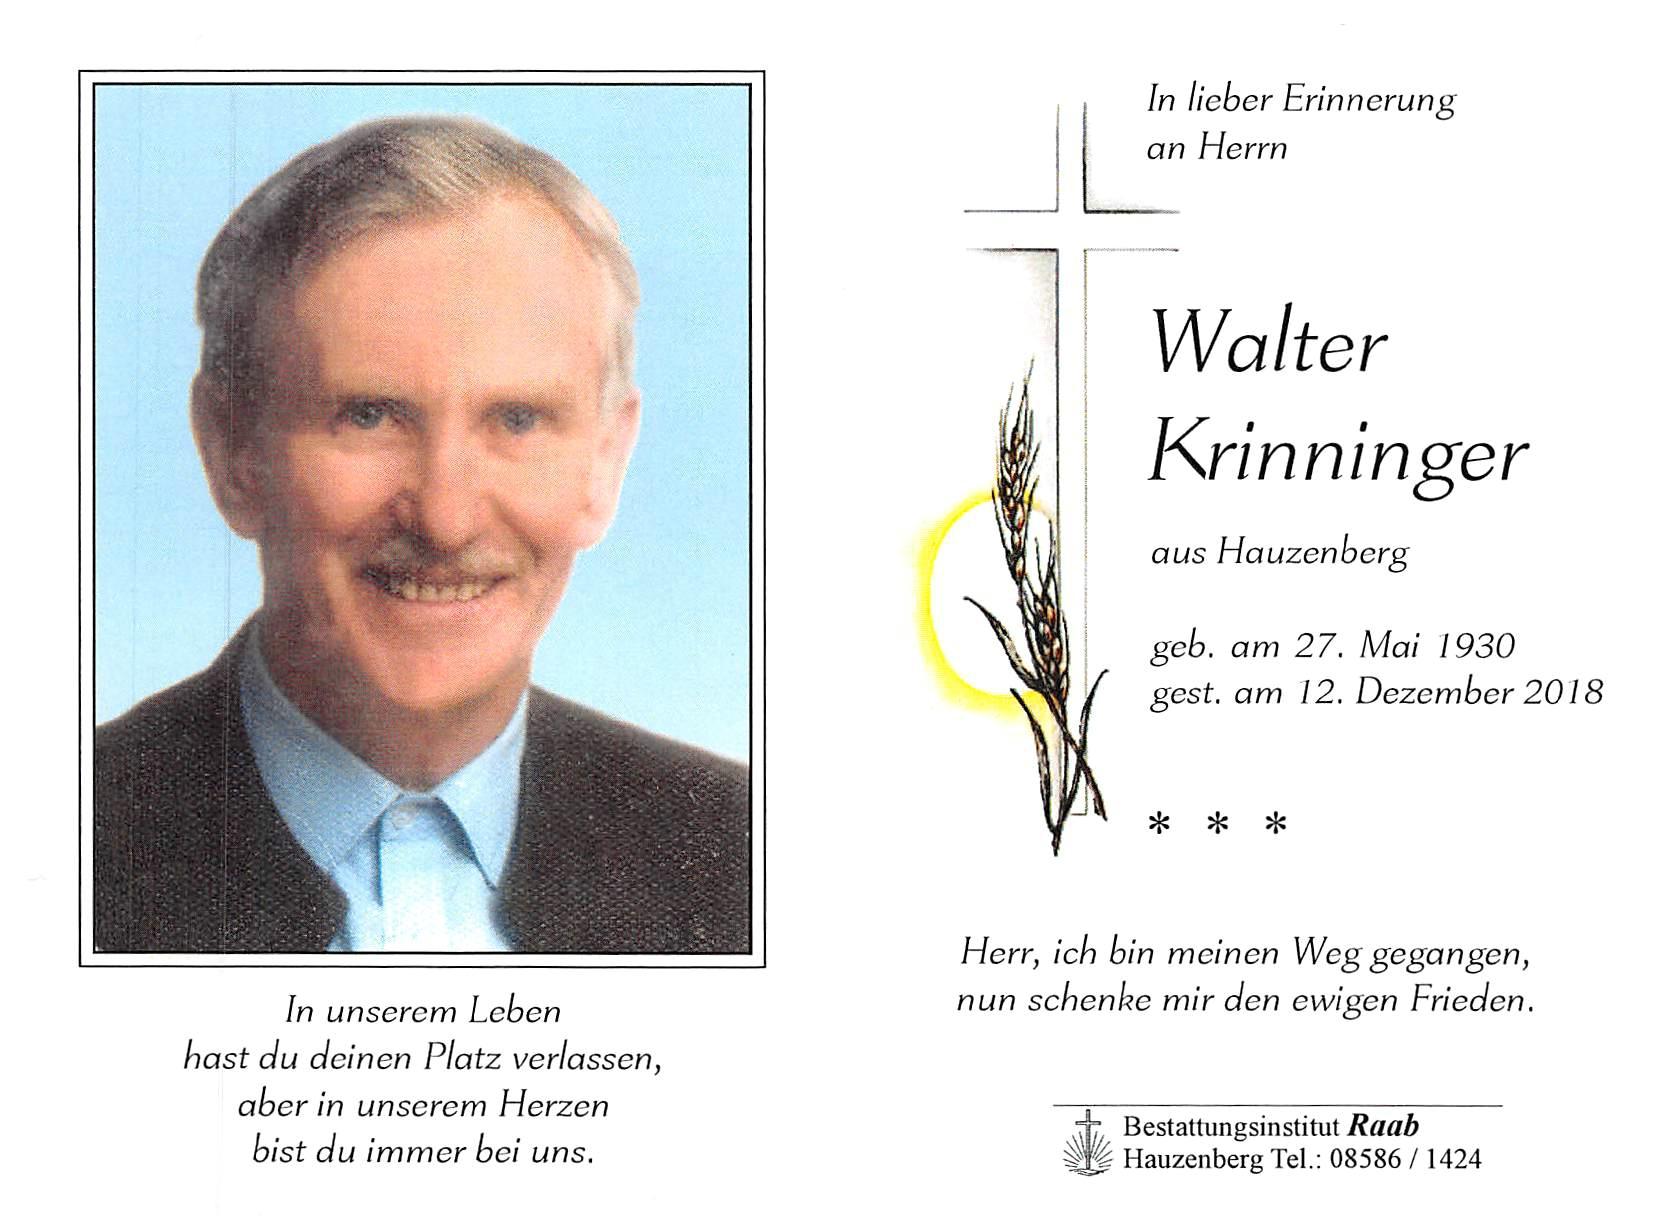 2018-12-12-Krinninger-Walter-Hauzenberg-Döbling-